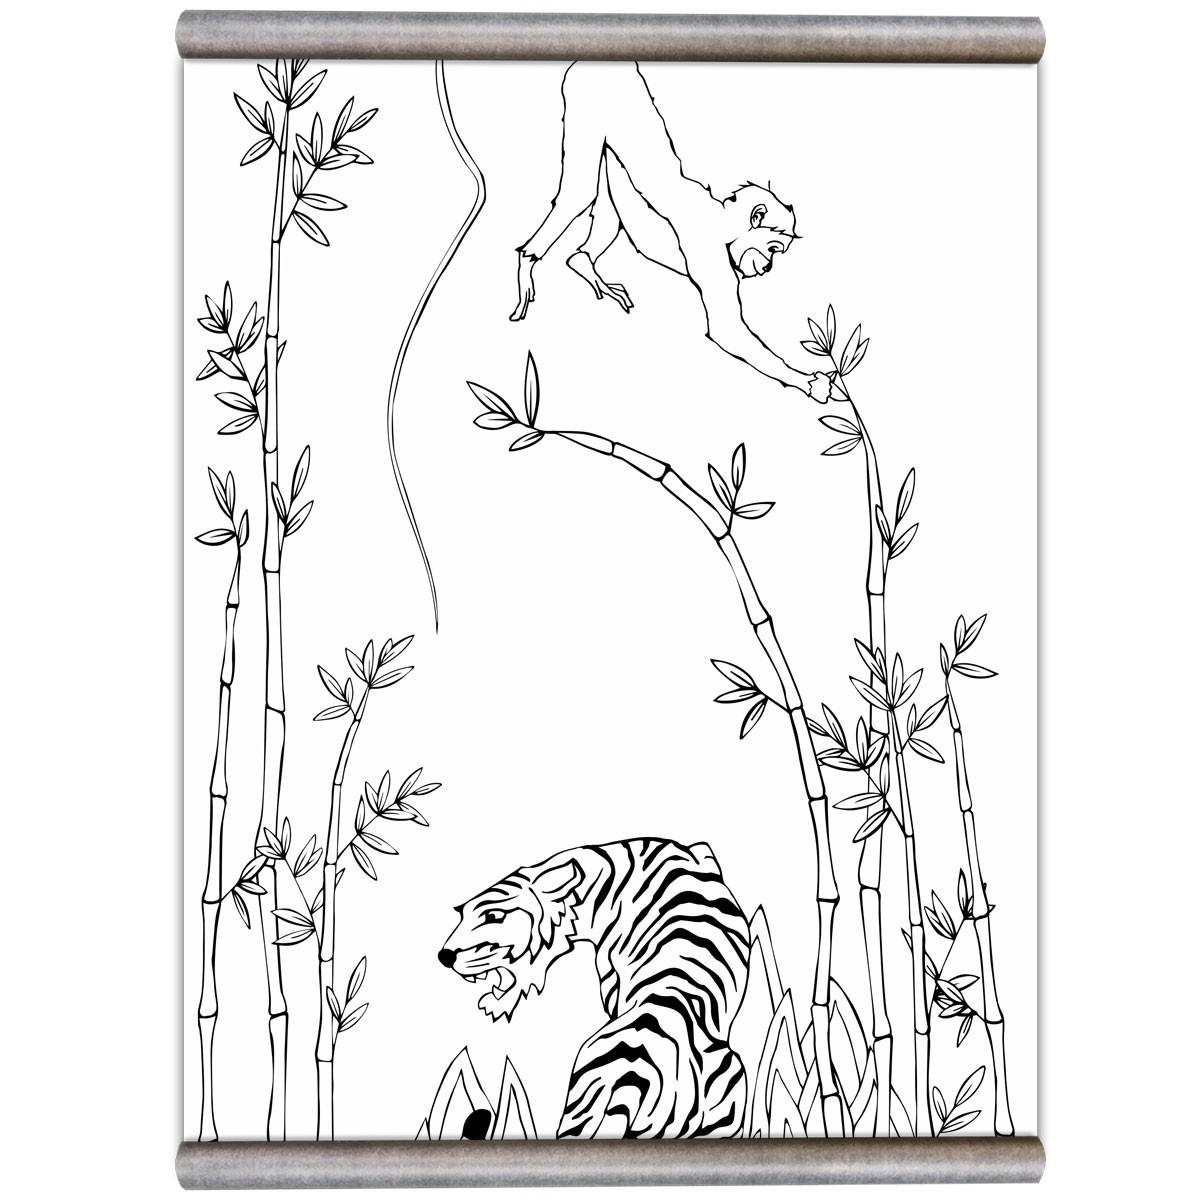 Groovy Magnets Wit magneetbehang jungleprint